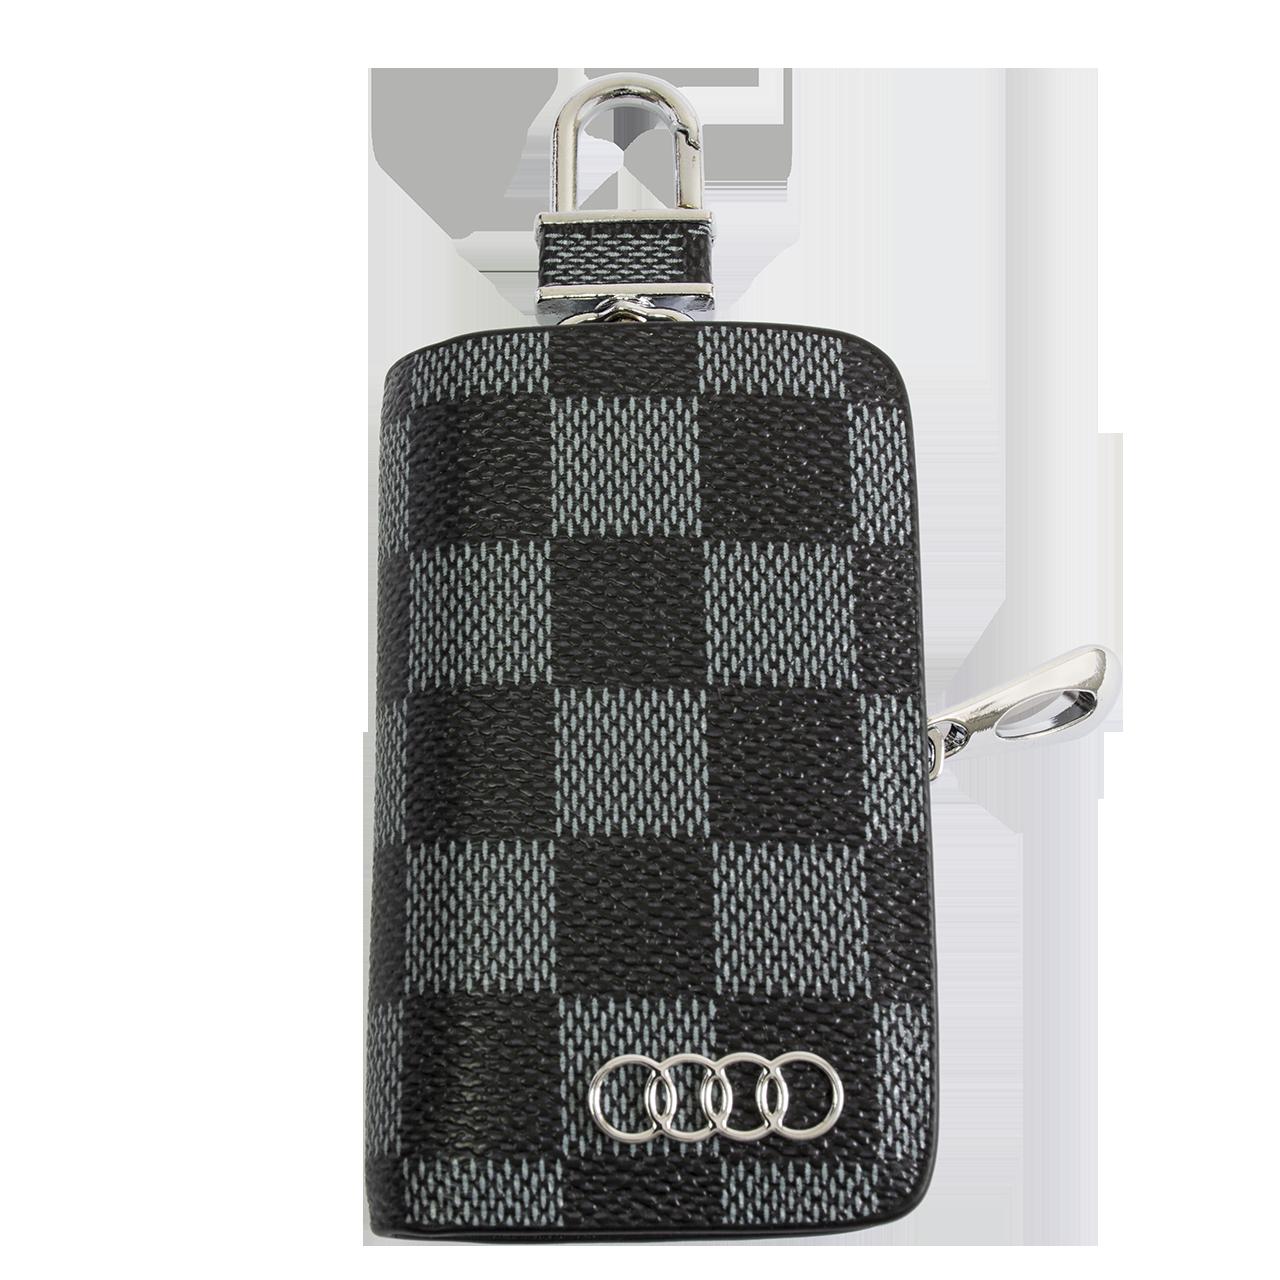 Ключница Carss с логотипом AUDI 01013 карбон серый